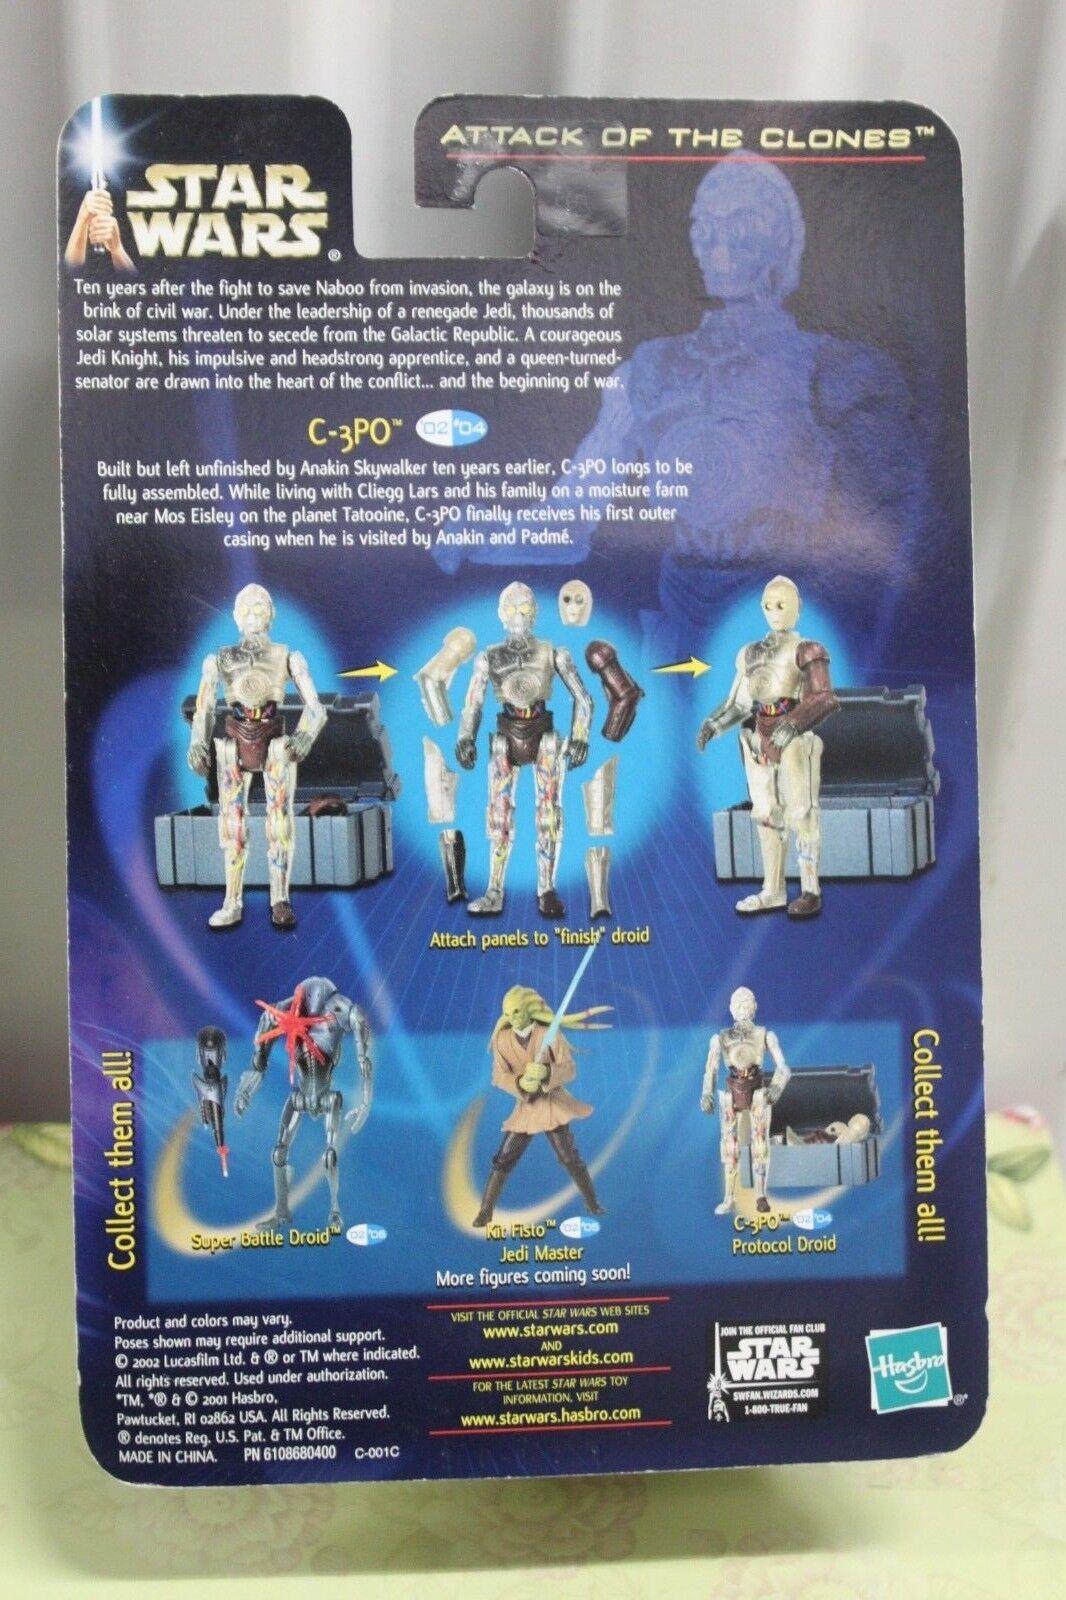 StarWars figurine : C-3po Amovible Panneaux Protocole Droid #4 Star Wars Attaque Clones 84856 2002